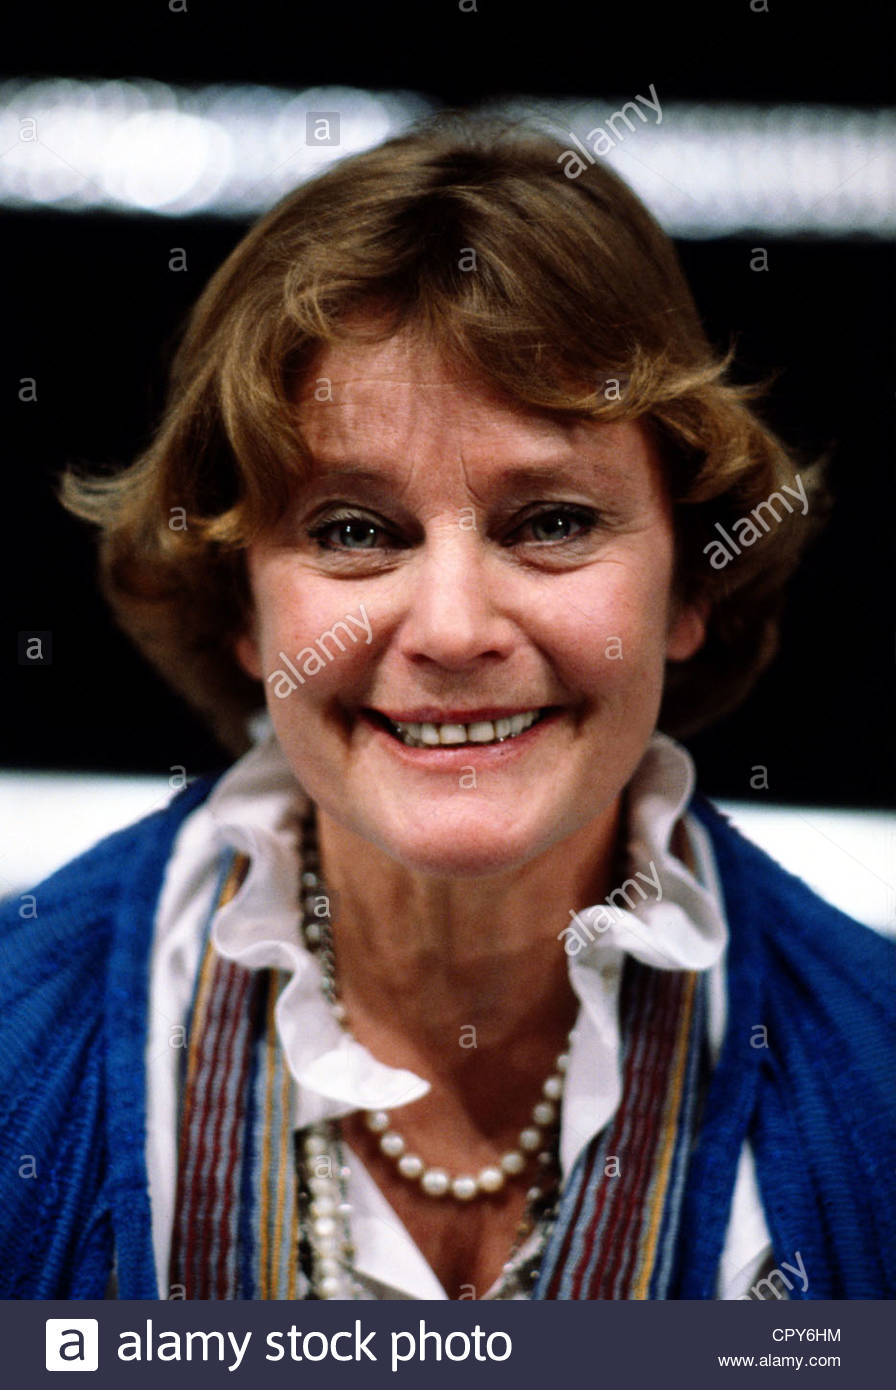 Schell, Maria, 15.1.1926 - 26.4.2005, Austrian actress, portrait, circa 1980, smiling, smile, - Stock Image